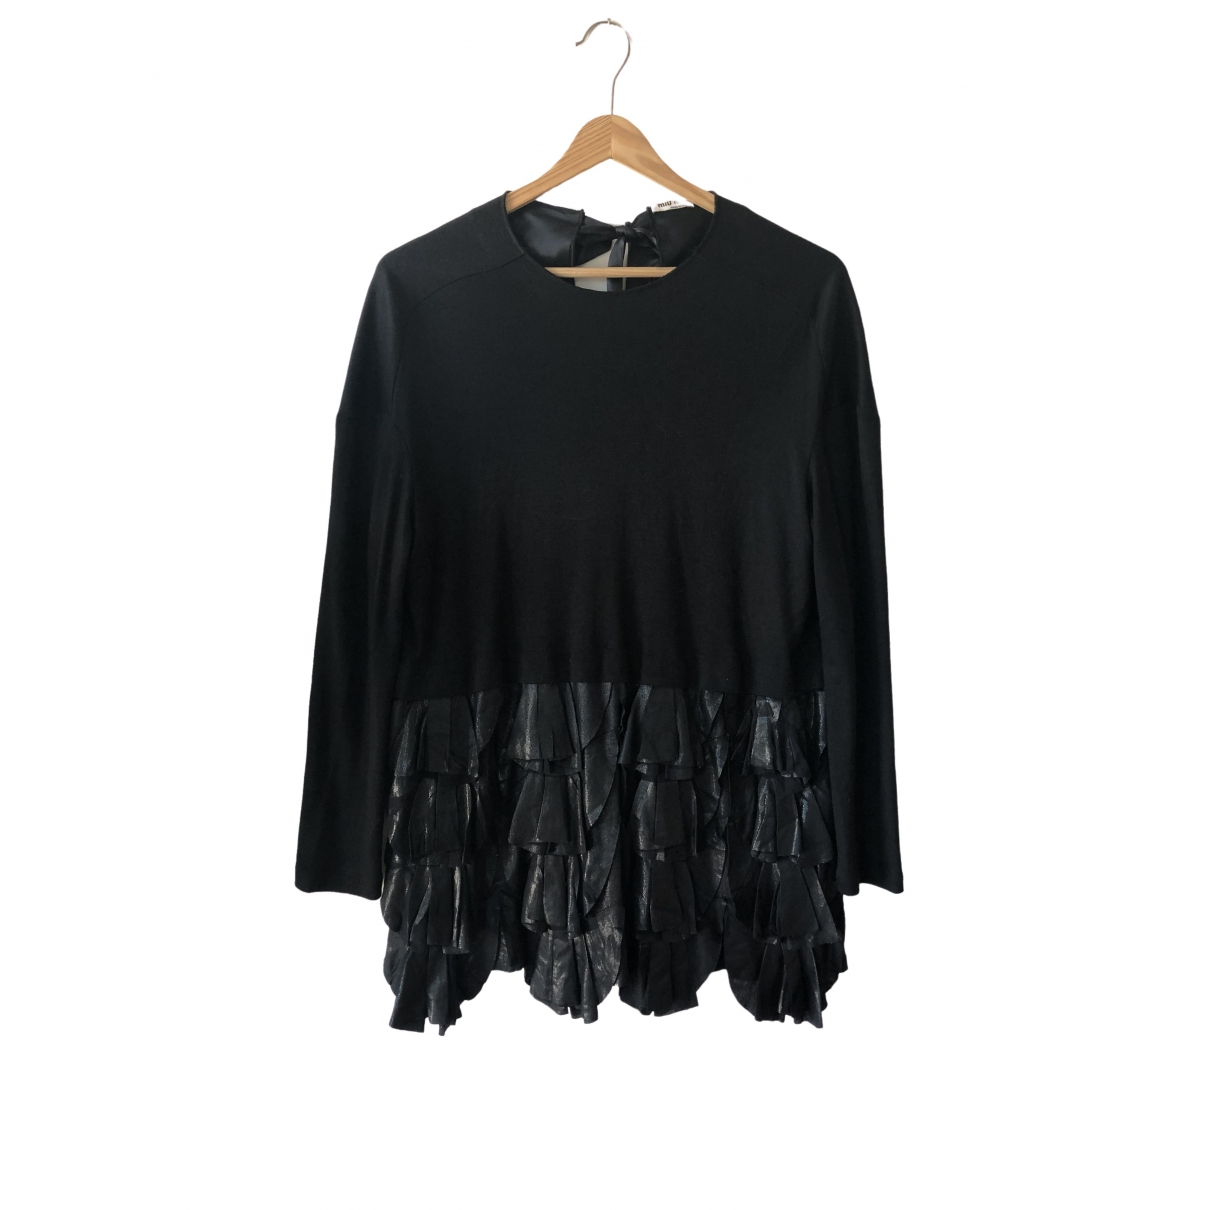 Miu Miu \N Black Wool  top for Women XS International